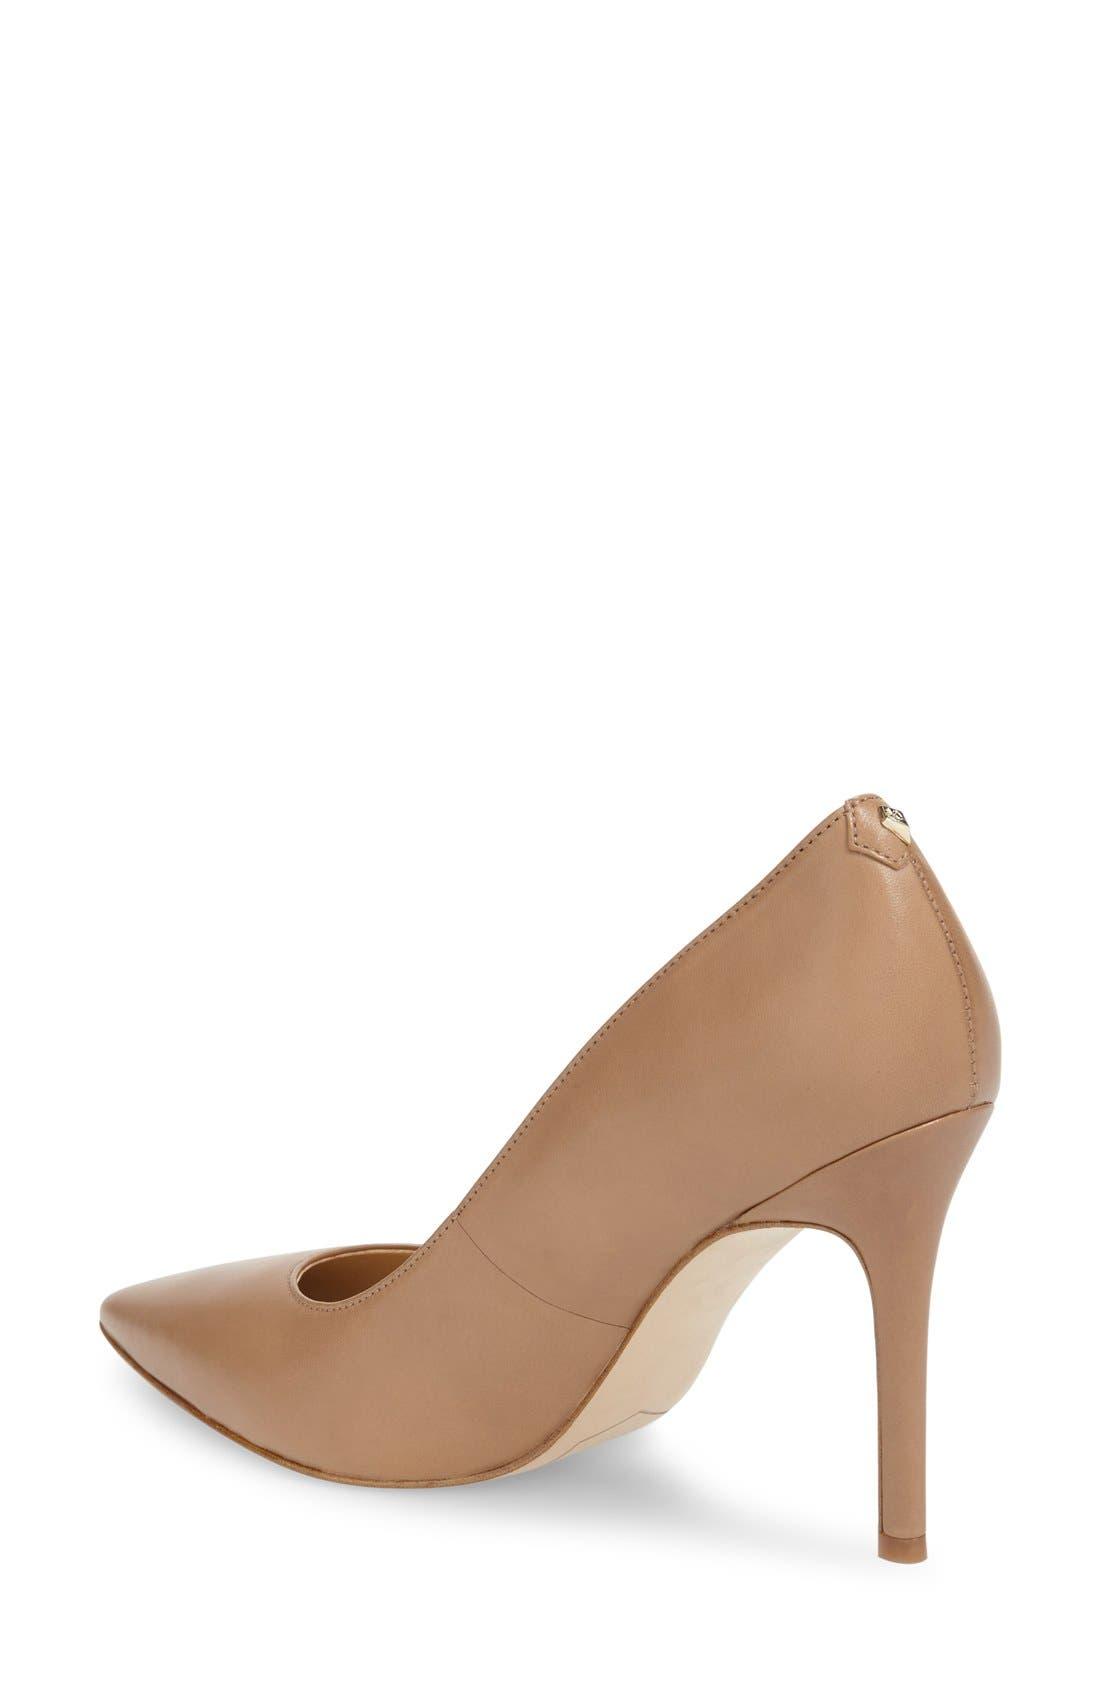 All Women s Narrow Shoes